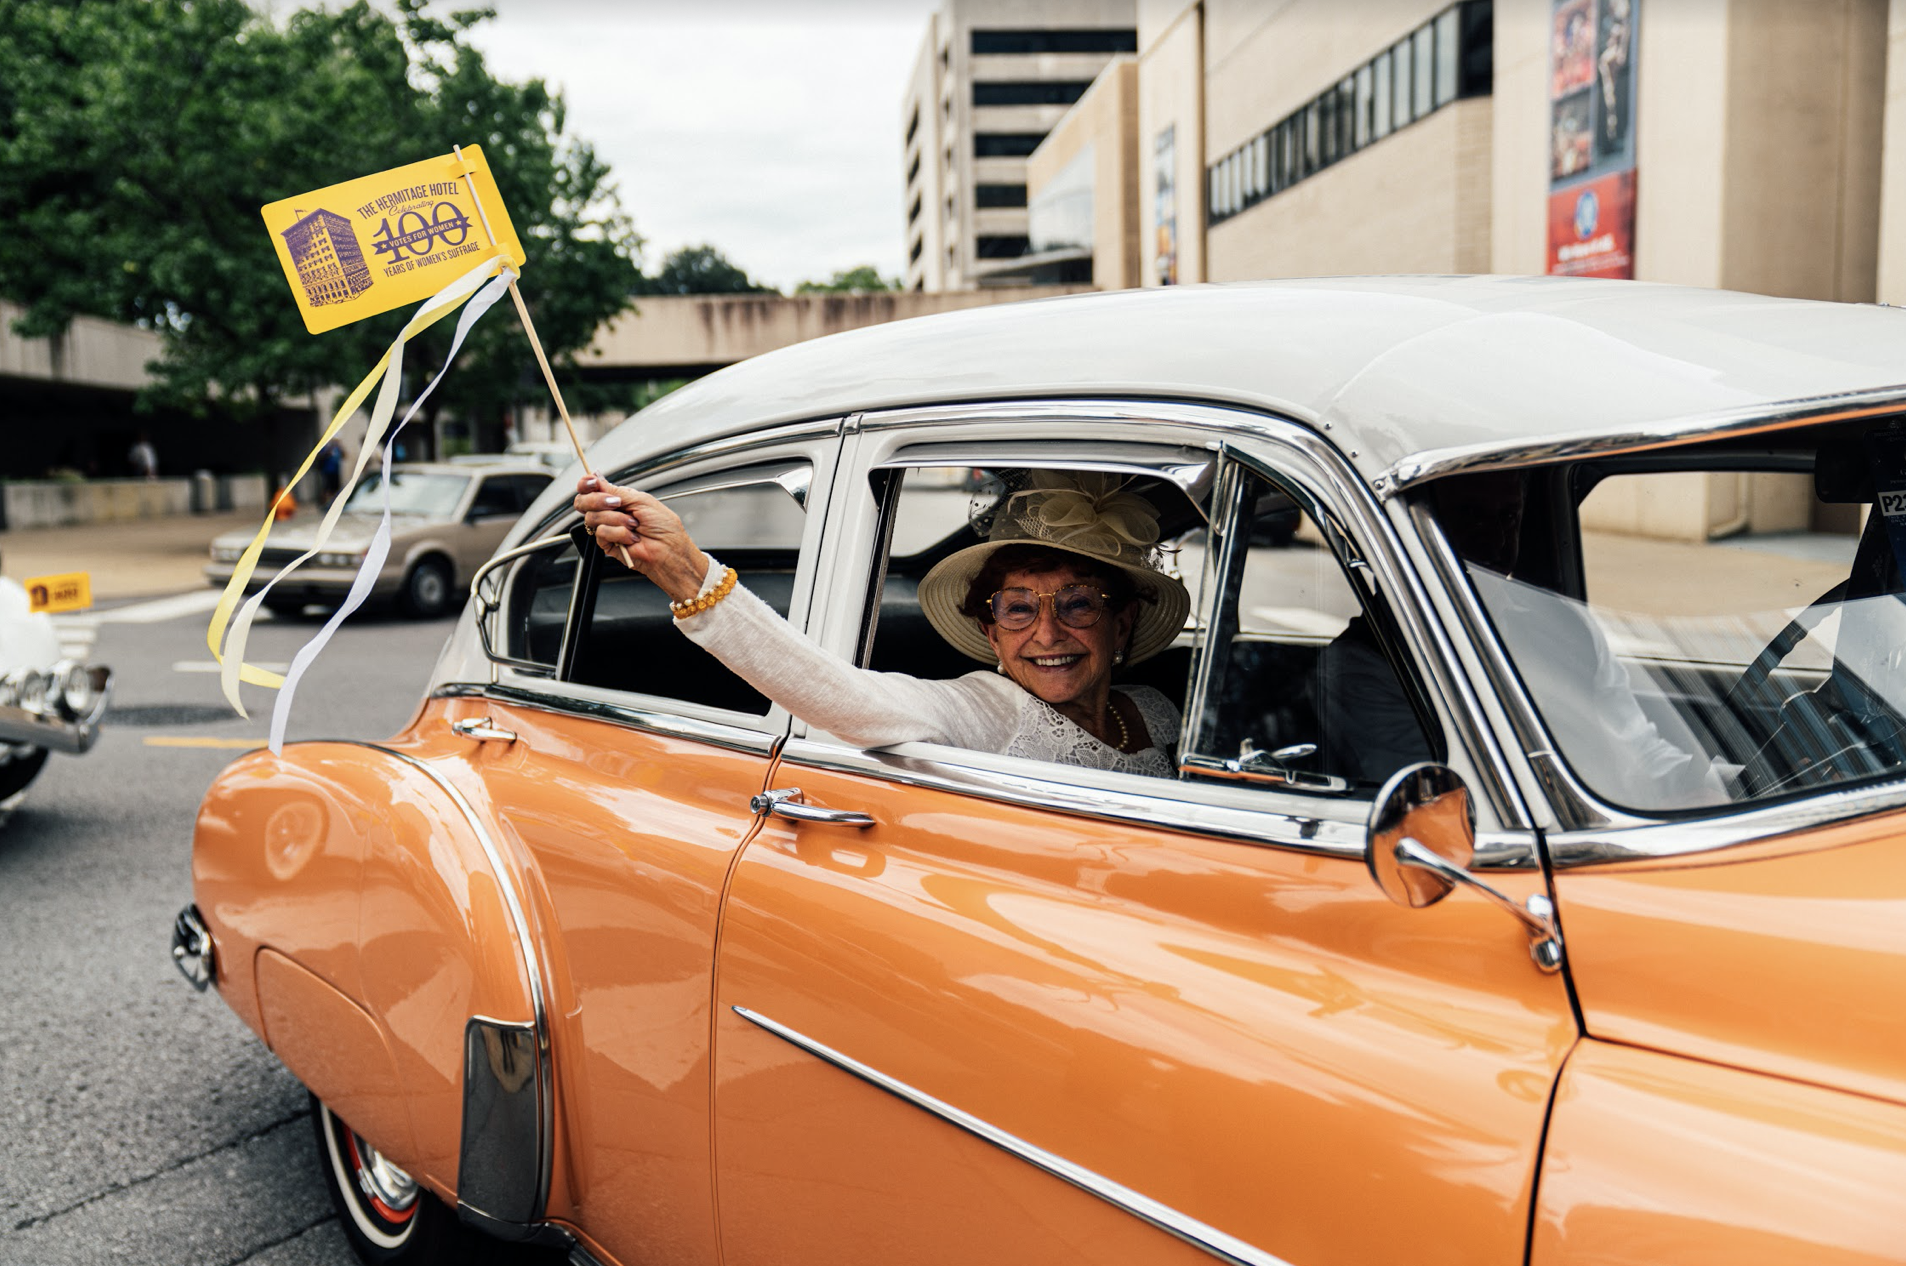 Nashville, Tenn., Aug. 18 - Celebration of the ratification of the 19th Amendment. (Photo: Alex Kent)